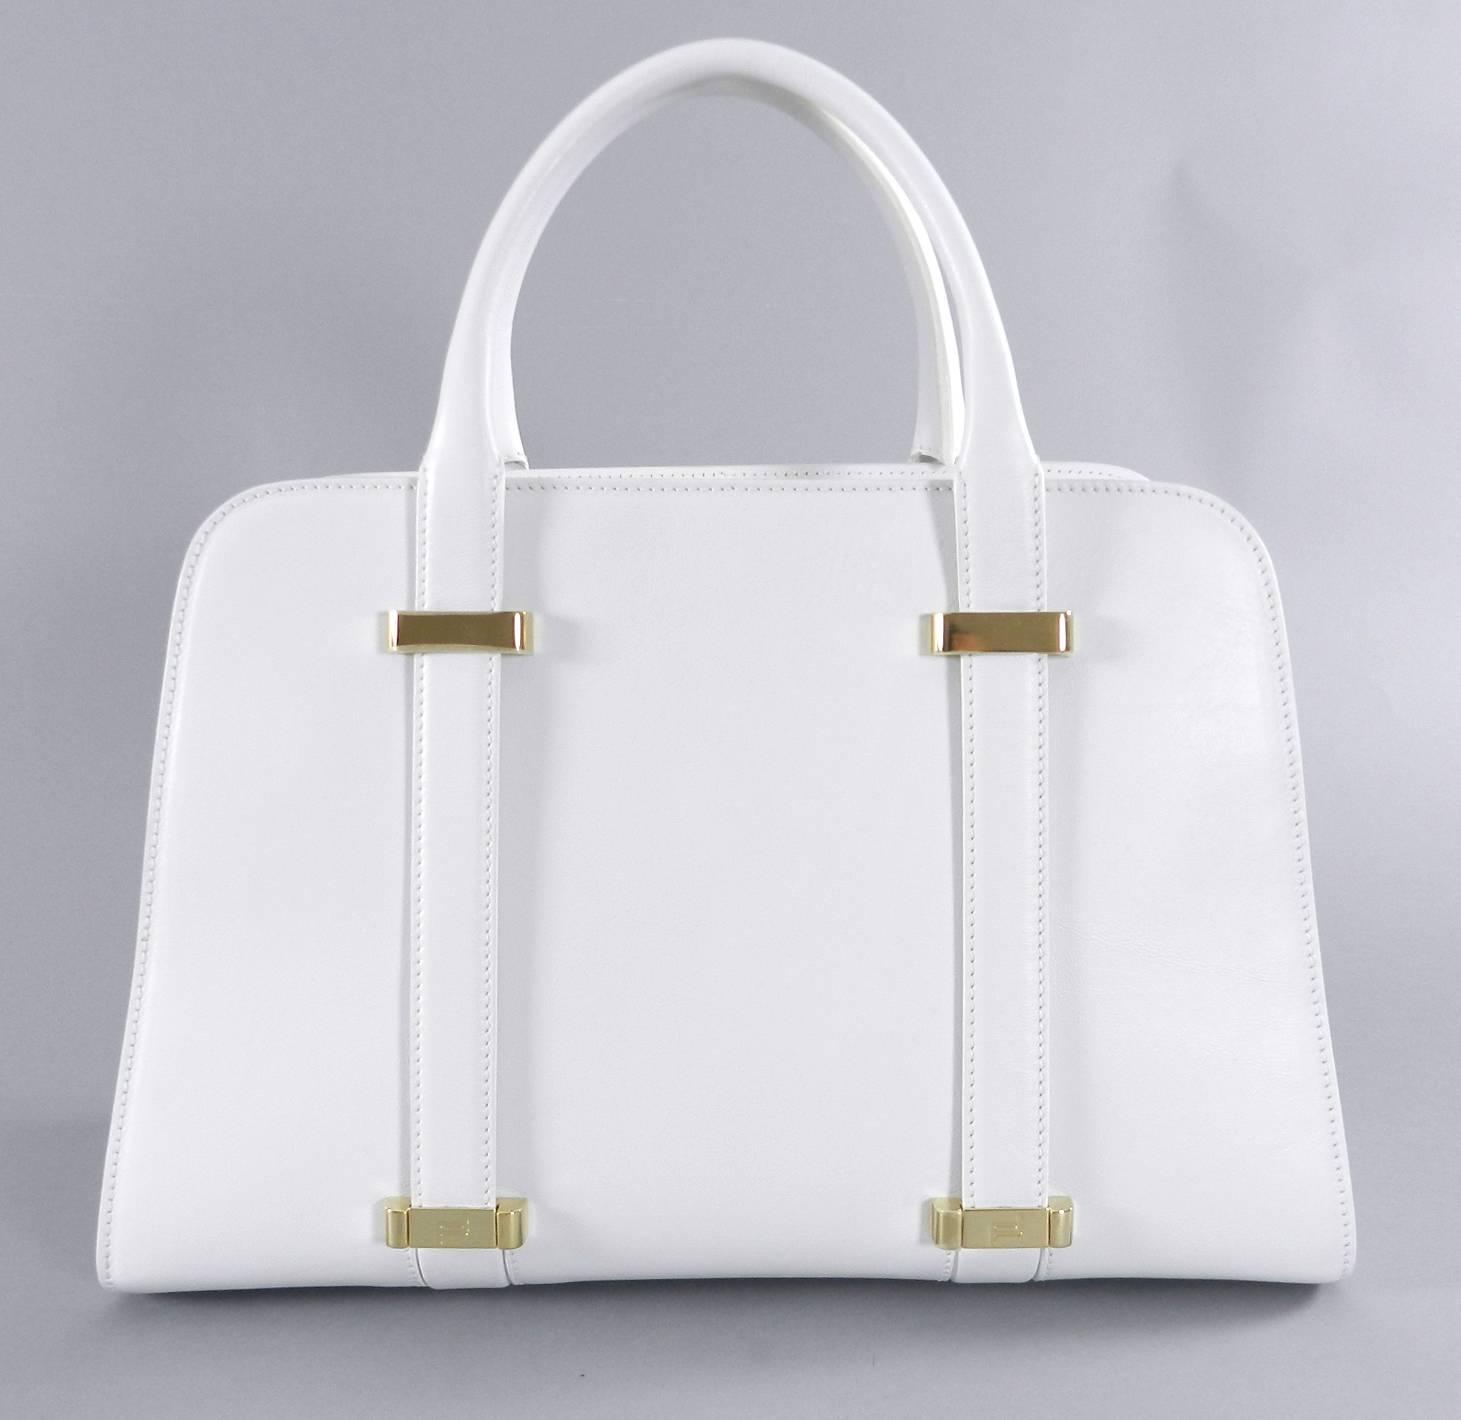 Porsche Design Twin Bag By Thierry Noir Limited Edition